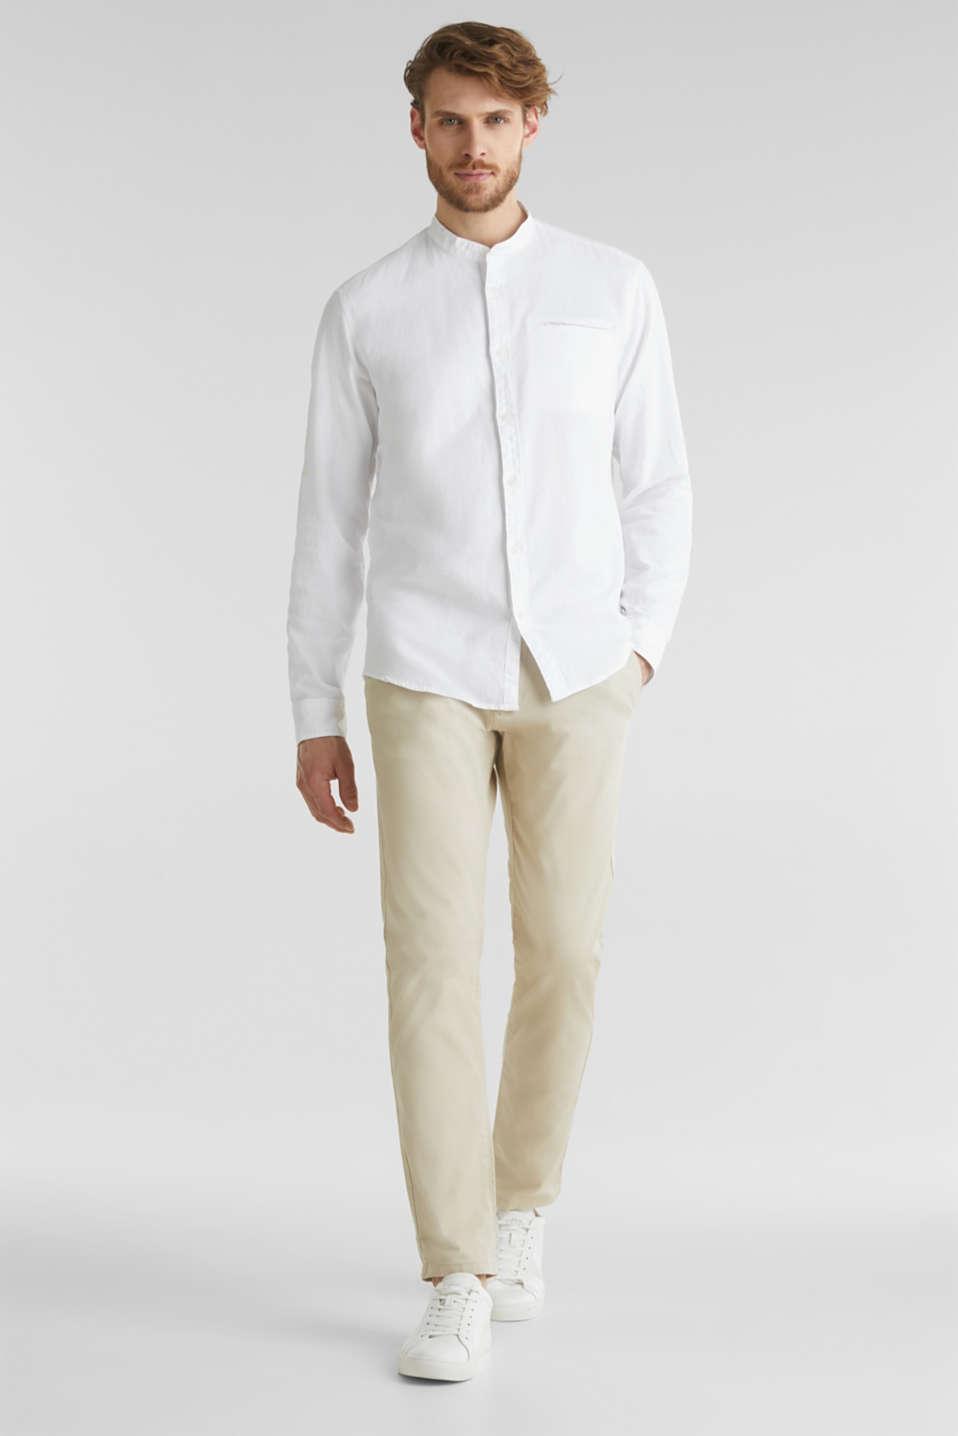 Textured shirt made of 100% organic, WHITE 5, detail image number 1